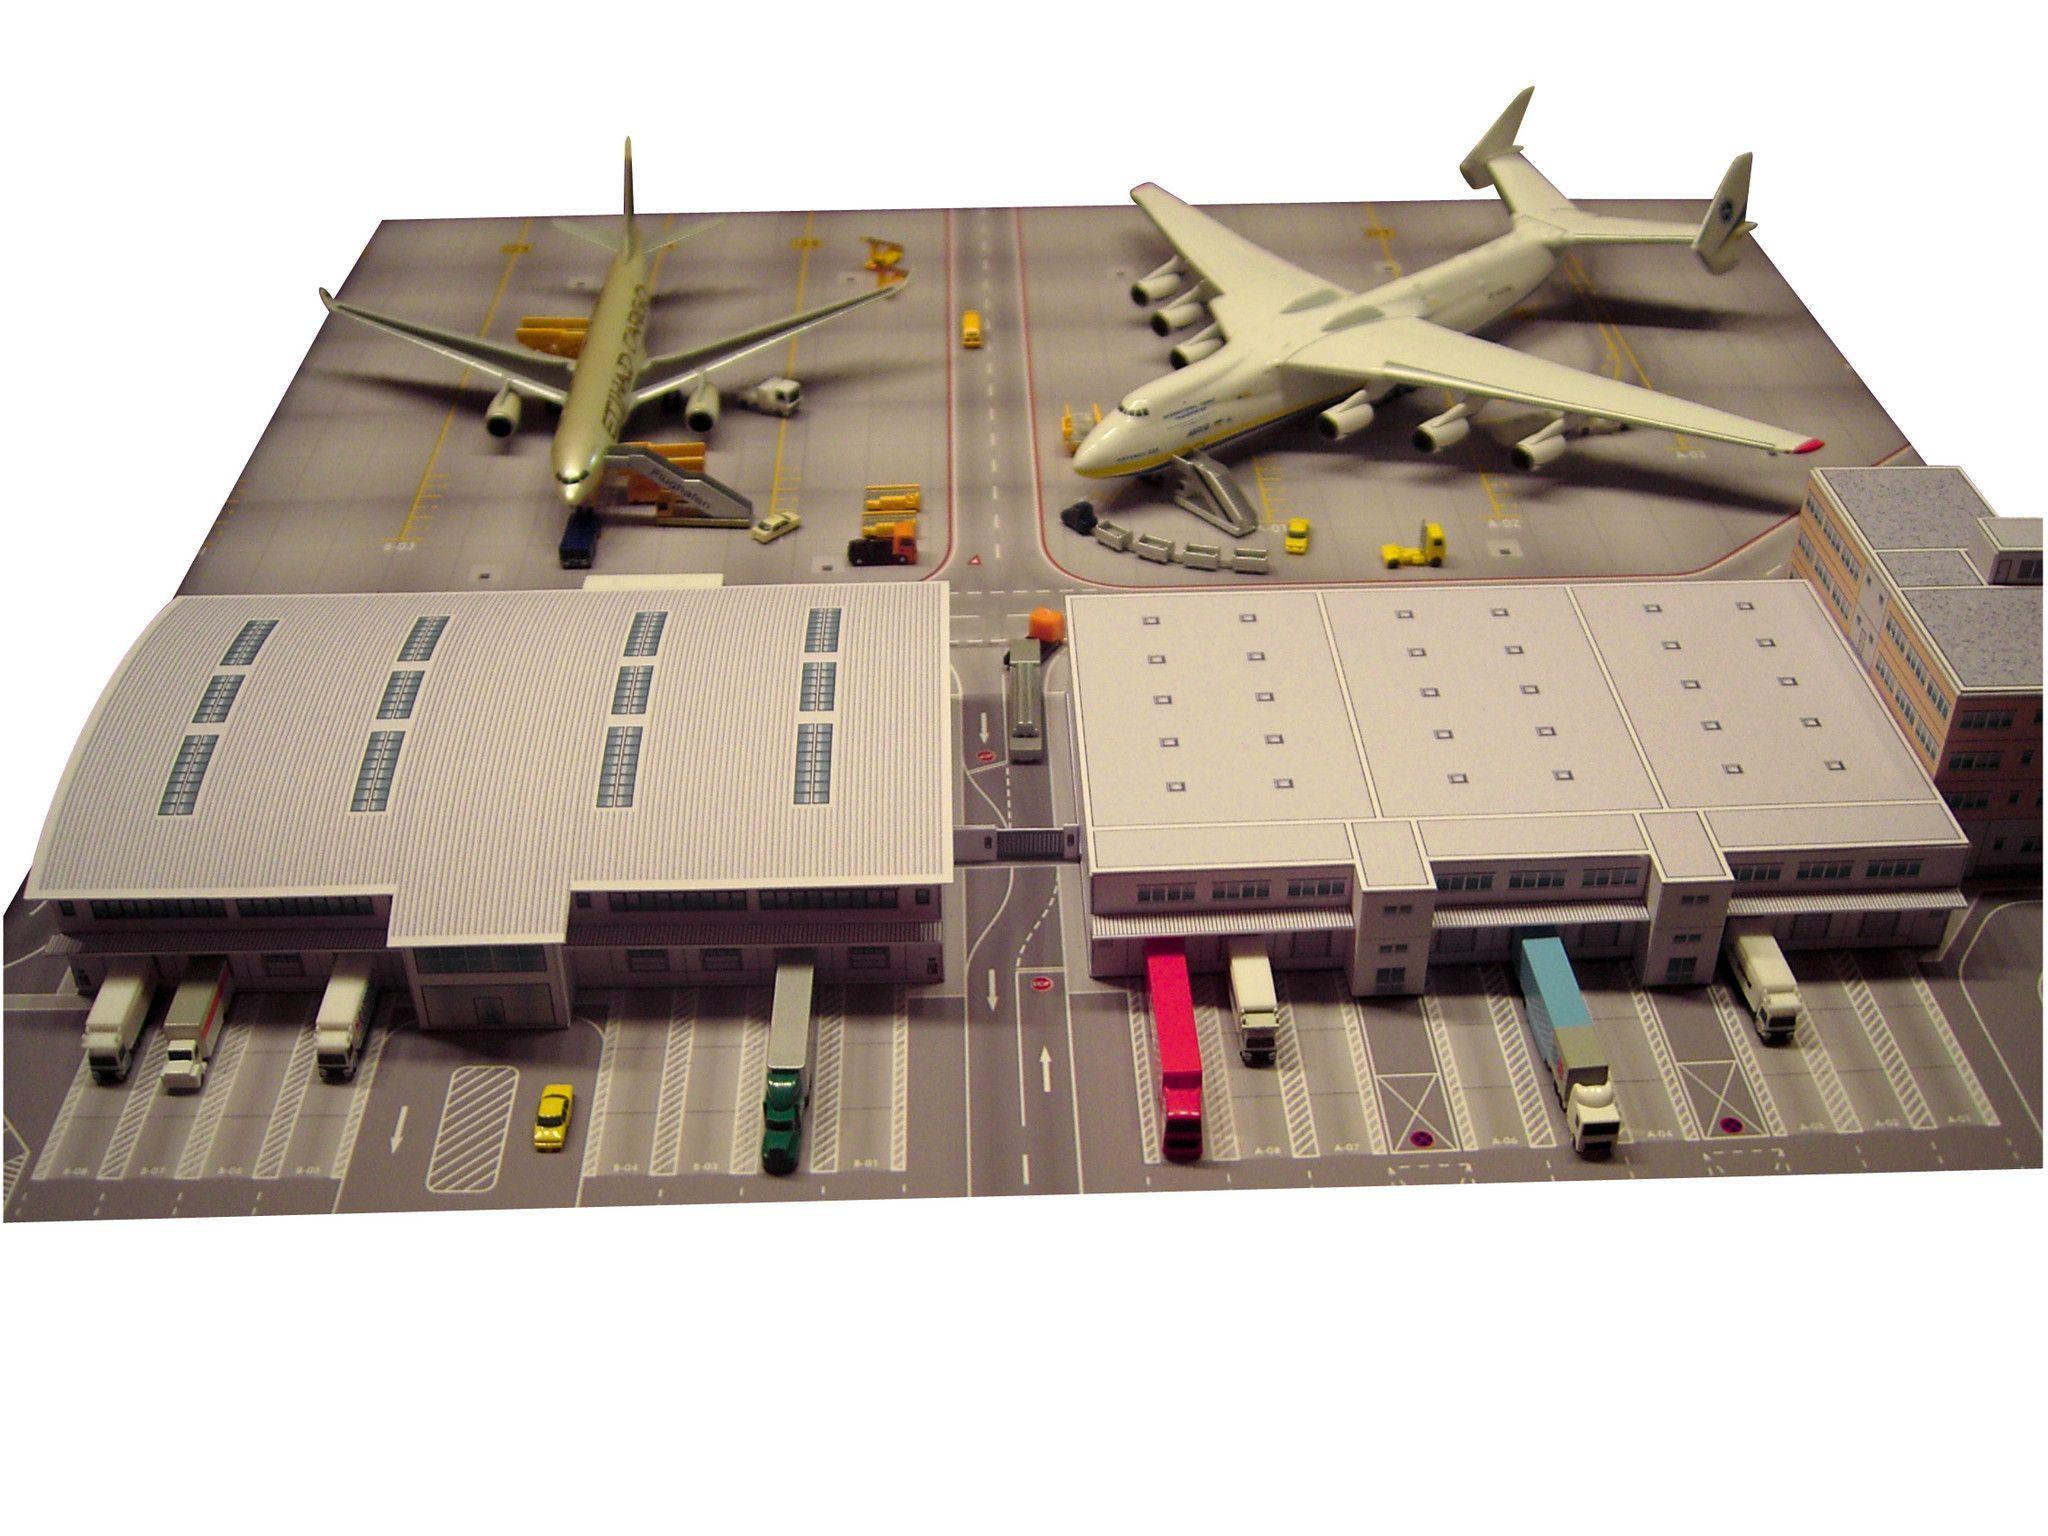 Airport Cargo Terminal Cardboard Model Cardboard Model Model Planes Airport